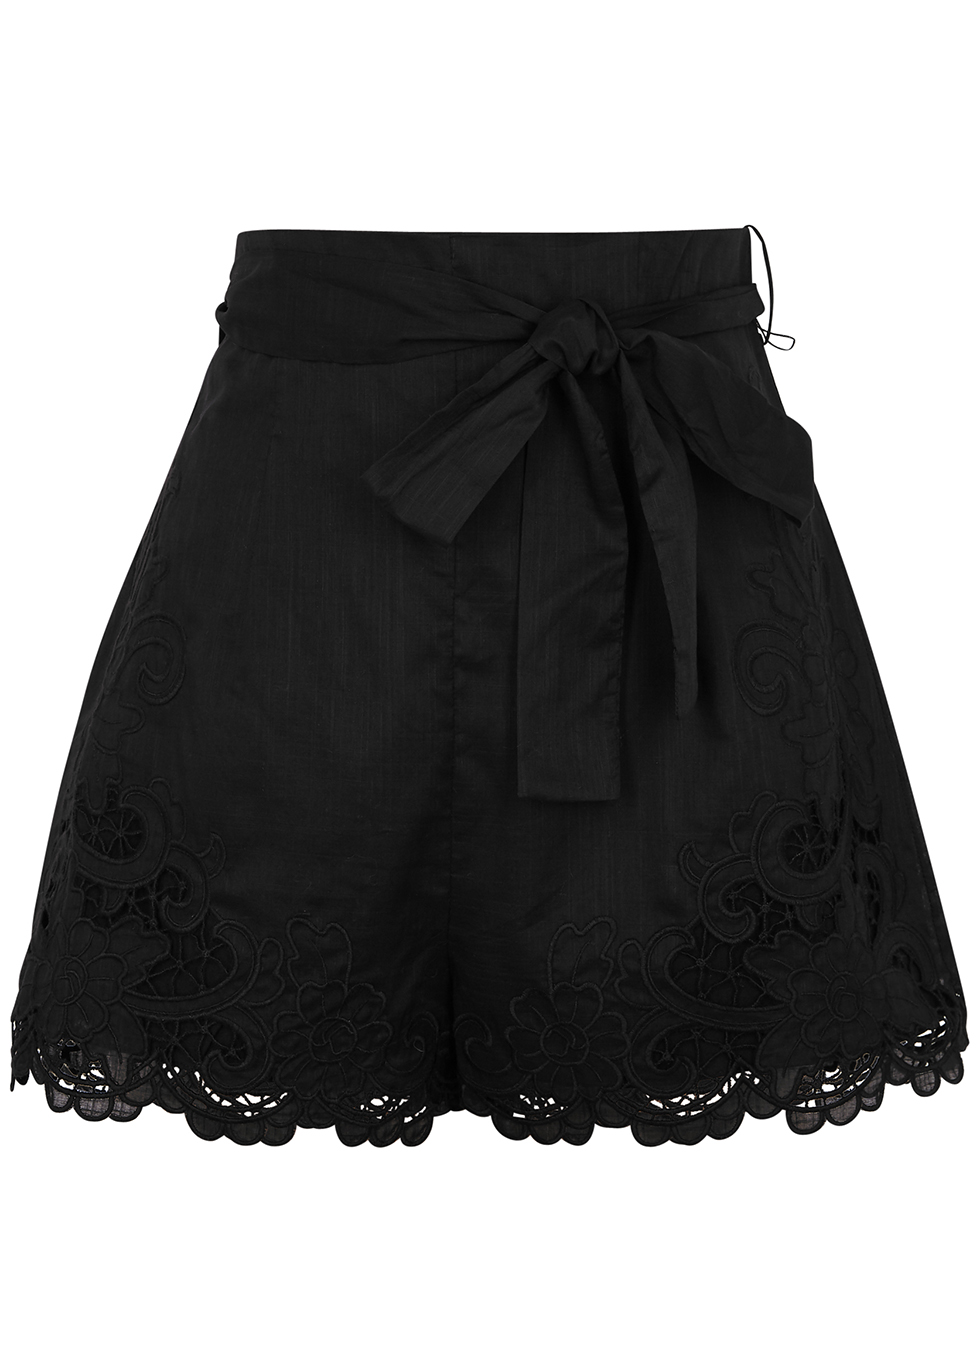 Brighton black cotton shorts